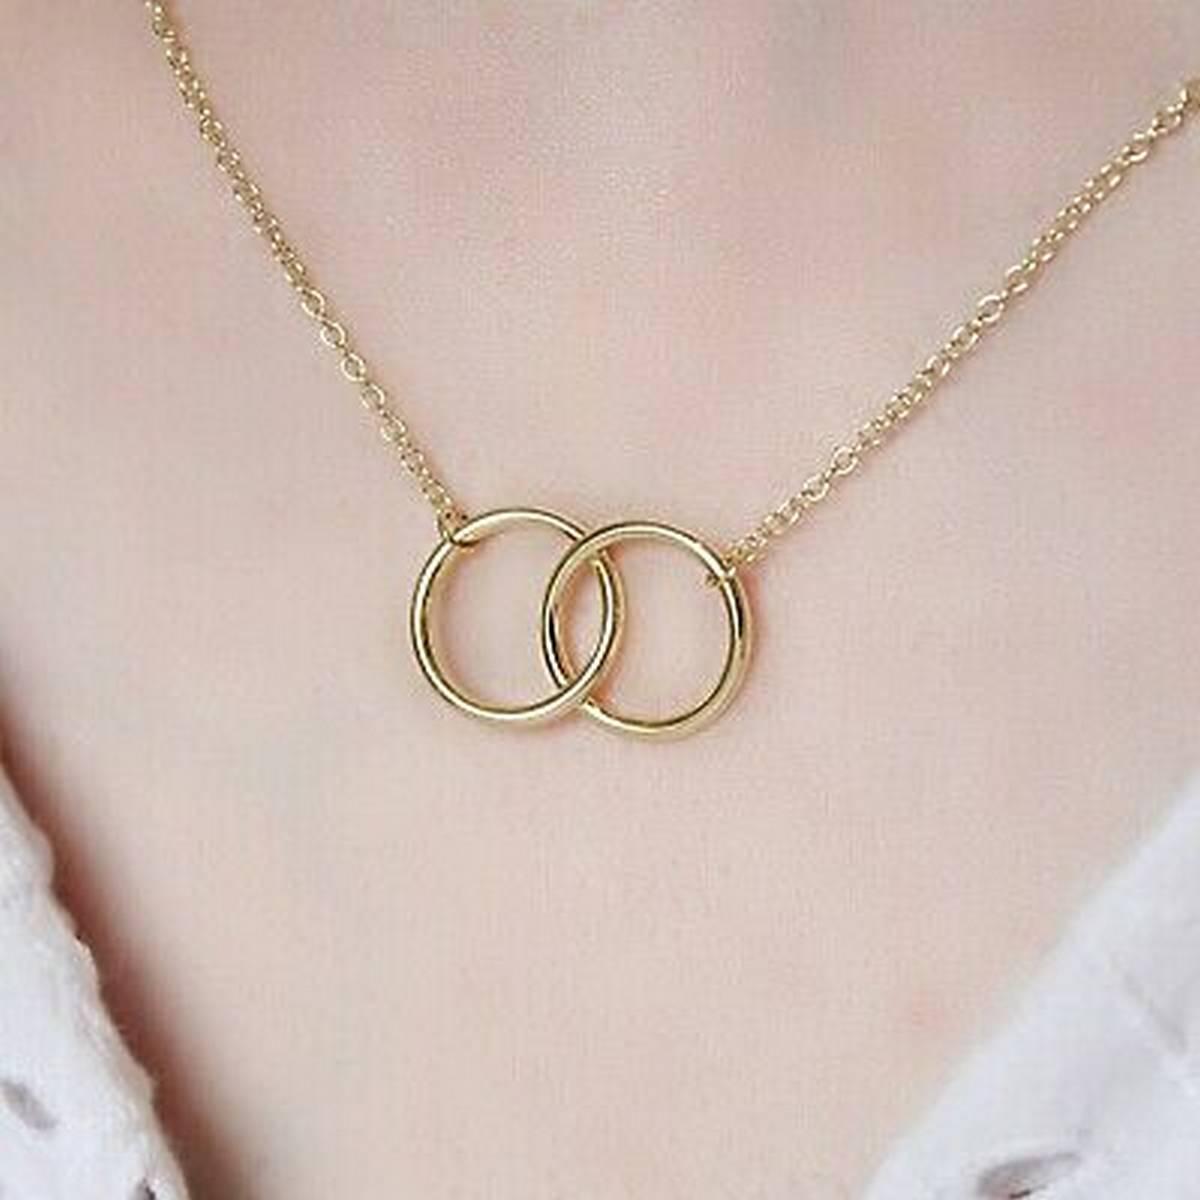 Golden/Silver Elegant Double Ring Necklace/Pendant/Chocker for Girls/Women